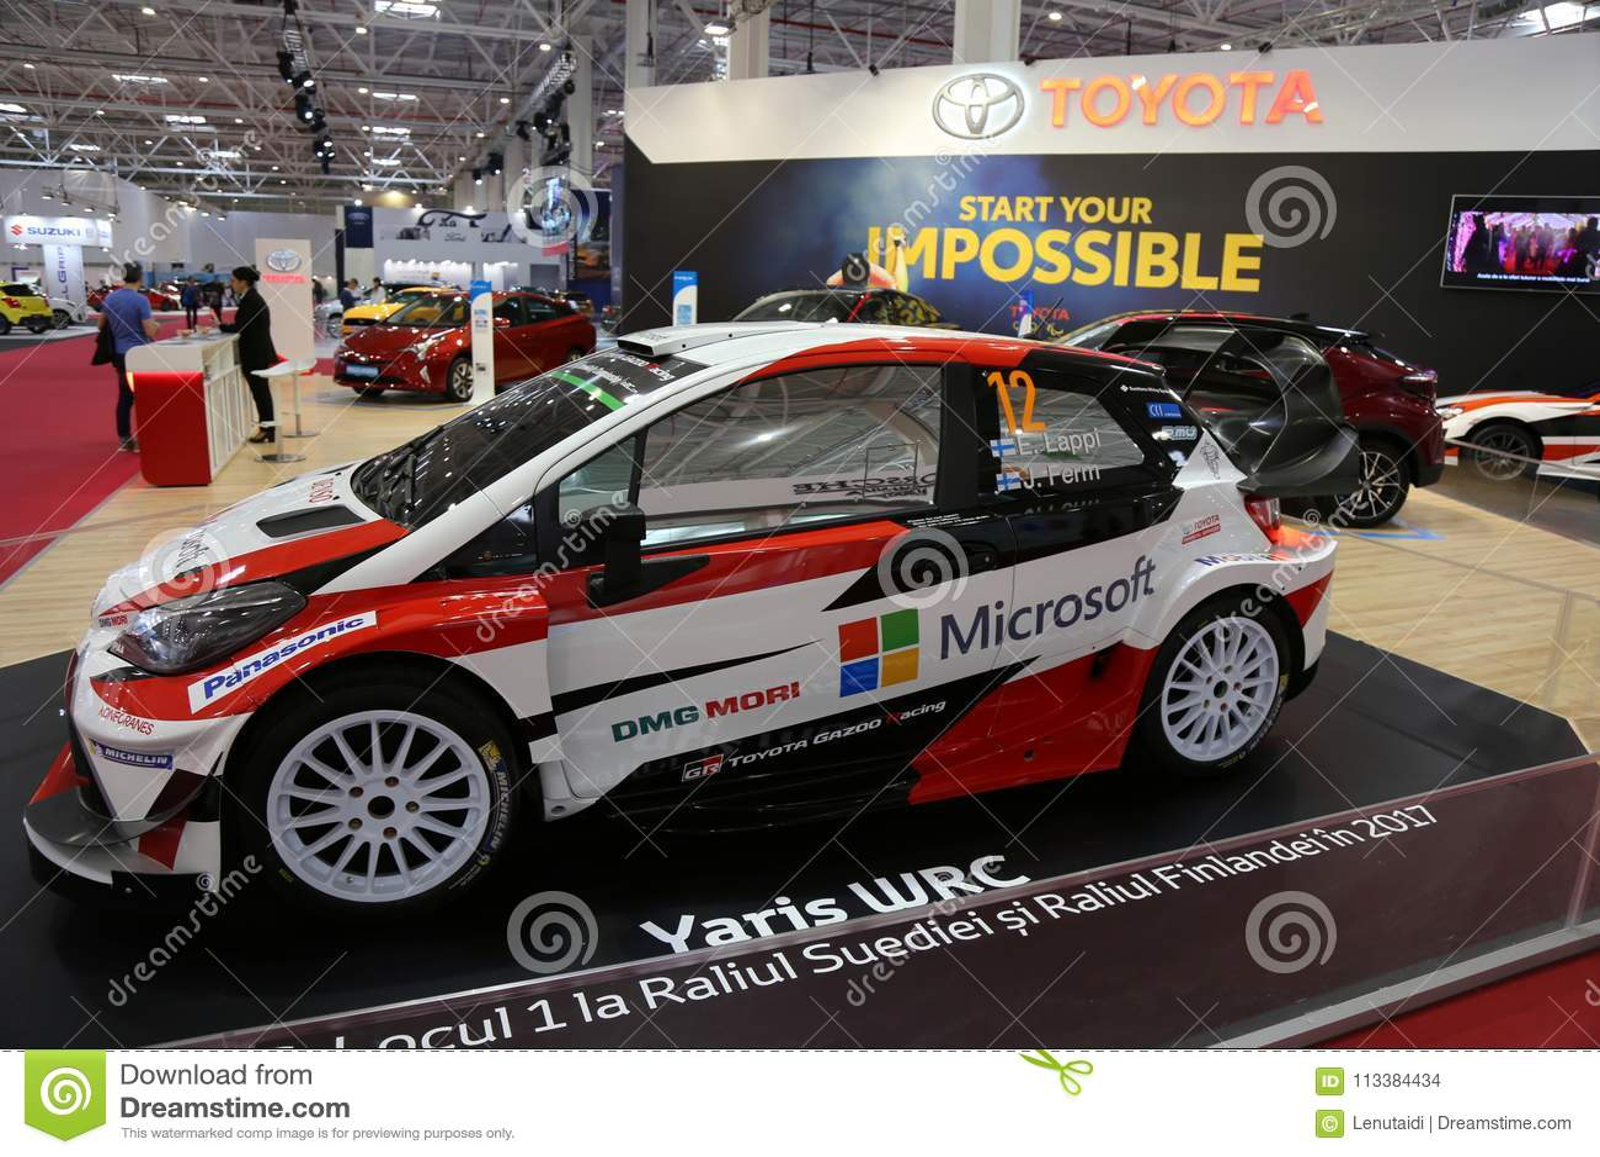 Toyota Yaris Wrc Rally At Siab 2018 Romexpo Bucharest Romania